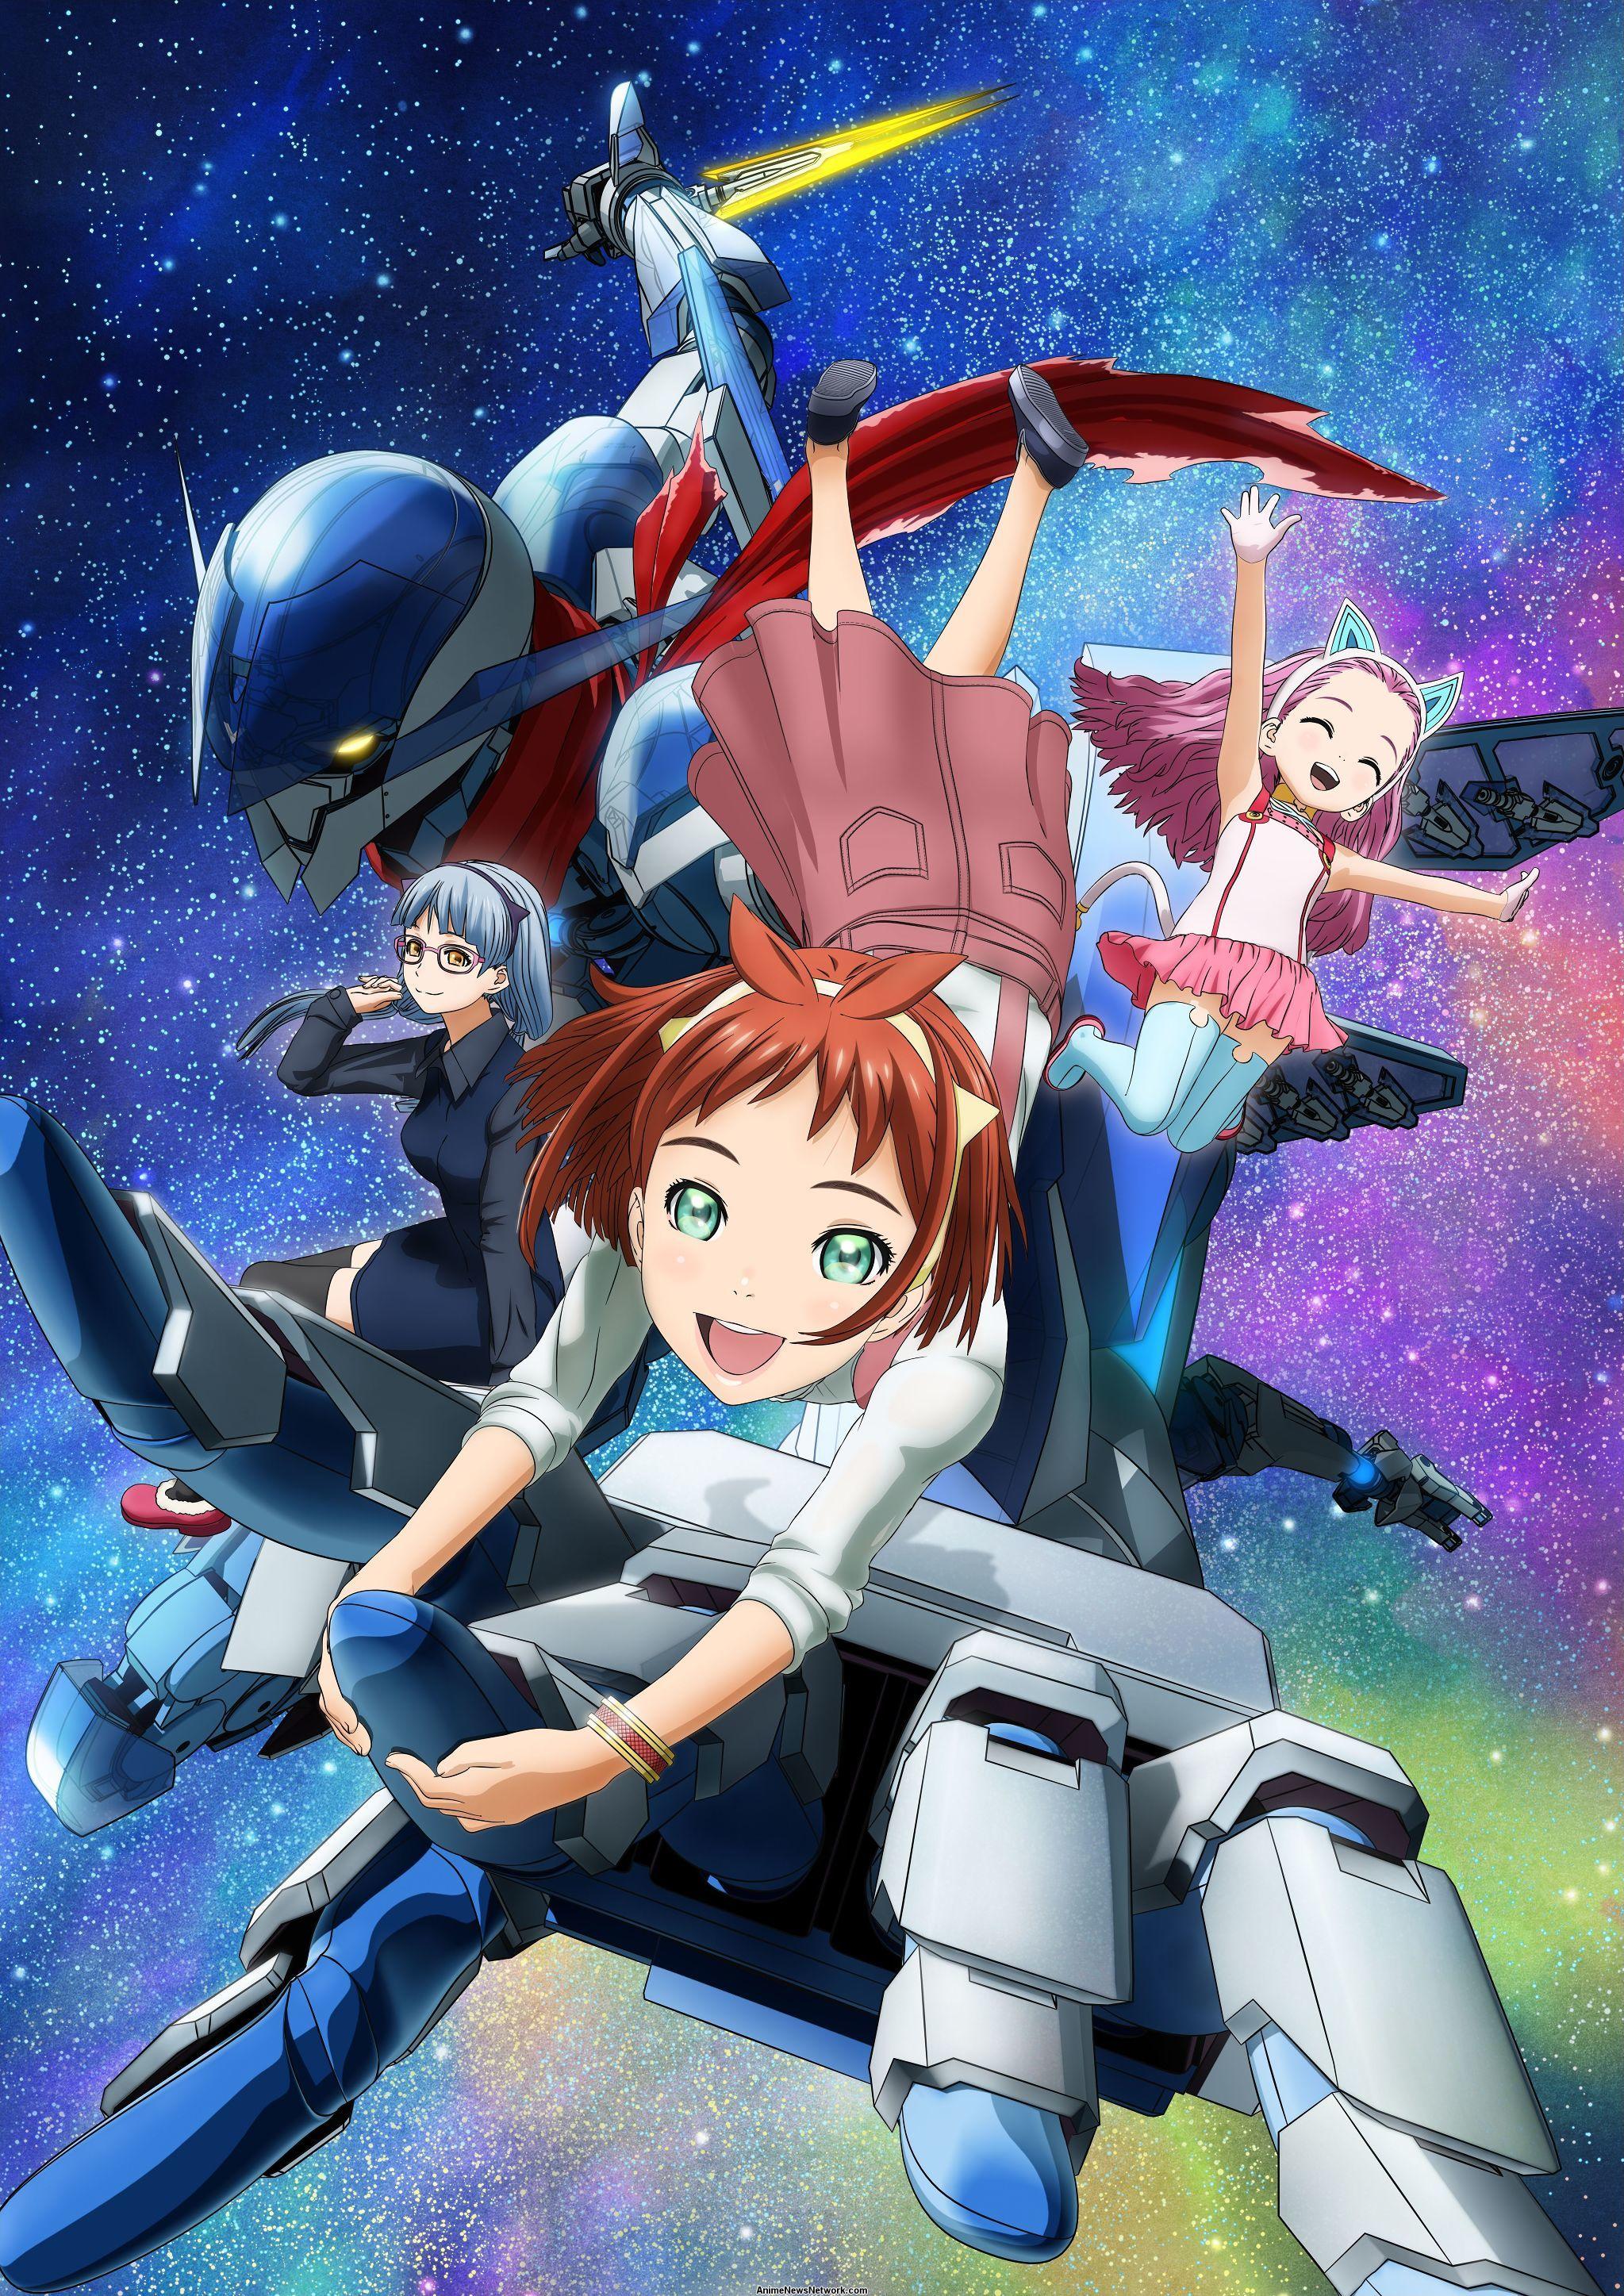 Anime Spotlight - ID-0 - Anime News Network